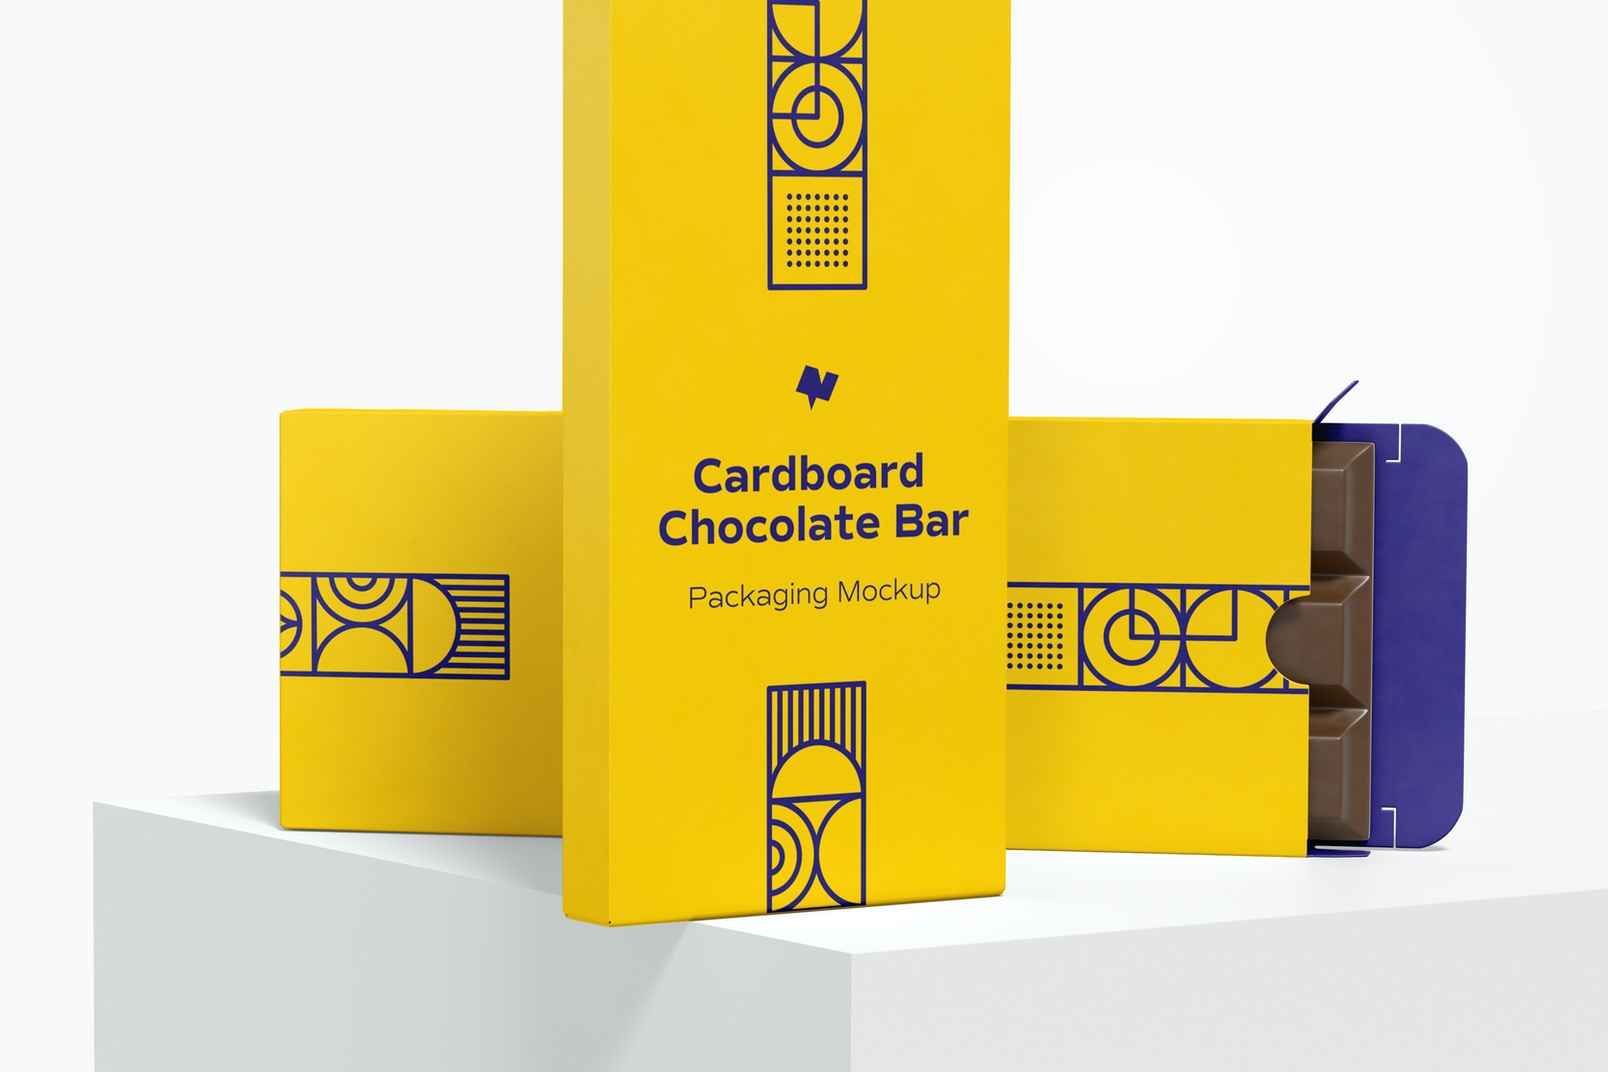 Cardboard Chocolate Bar Packaging Mockup, Dropped